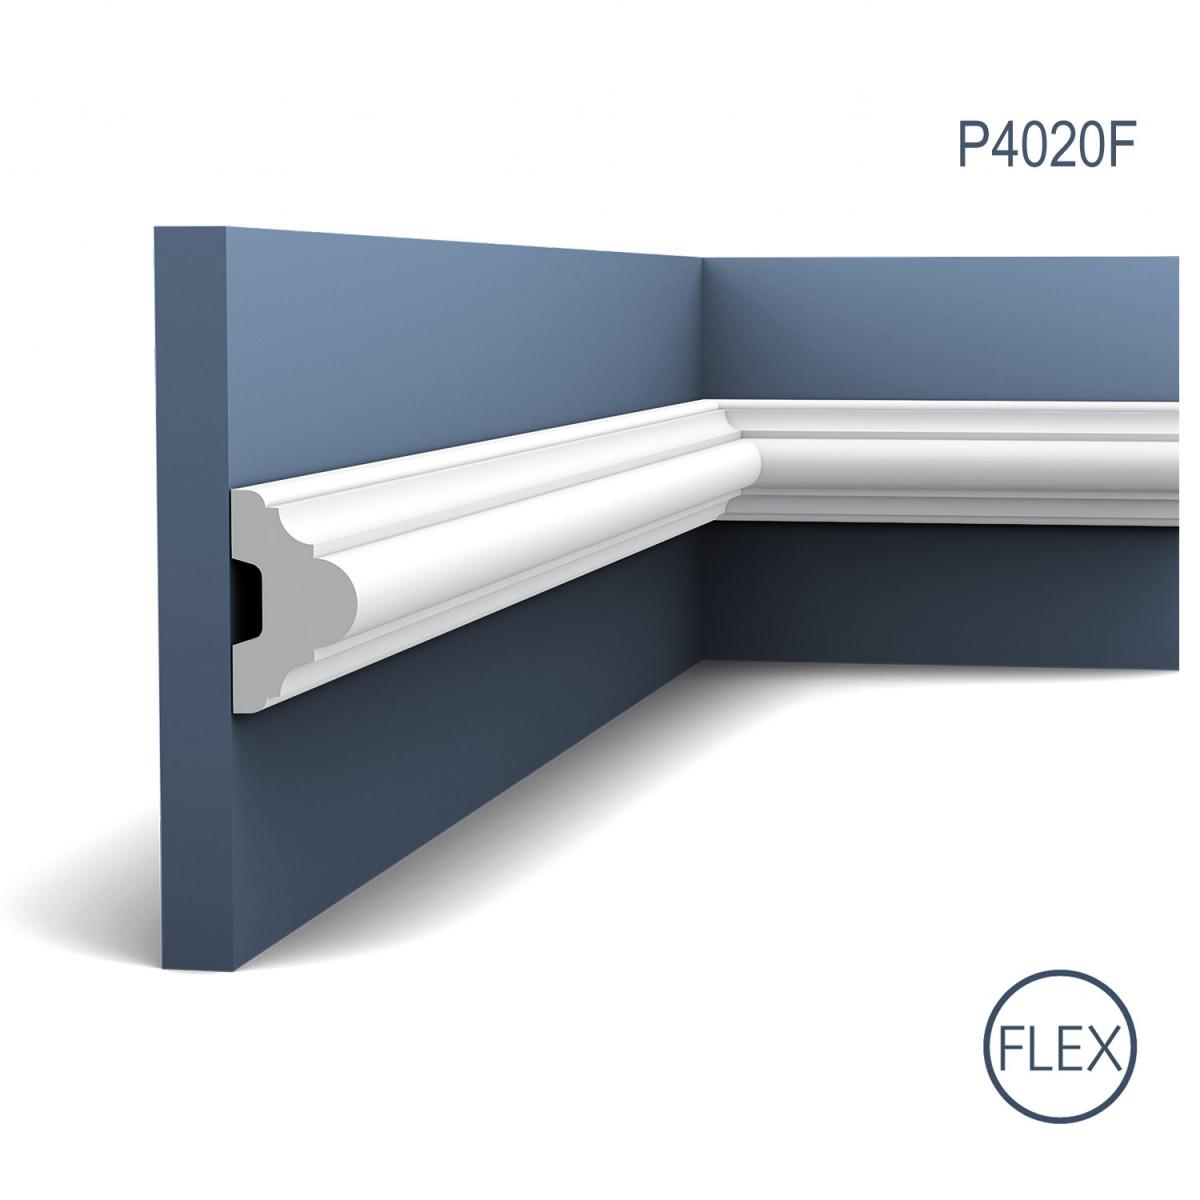 Brau Flex Luxxus P4020F, Dimensiuni: 200 X 5 X 2.9 cm, Orac Decor